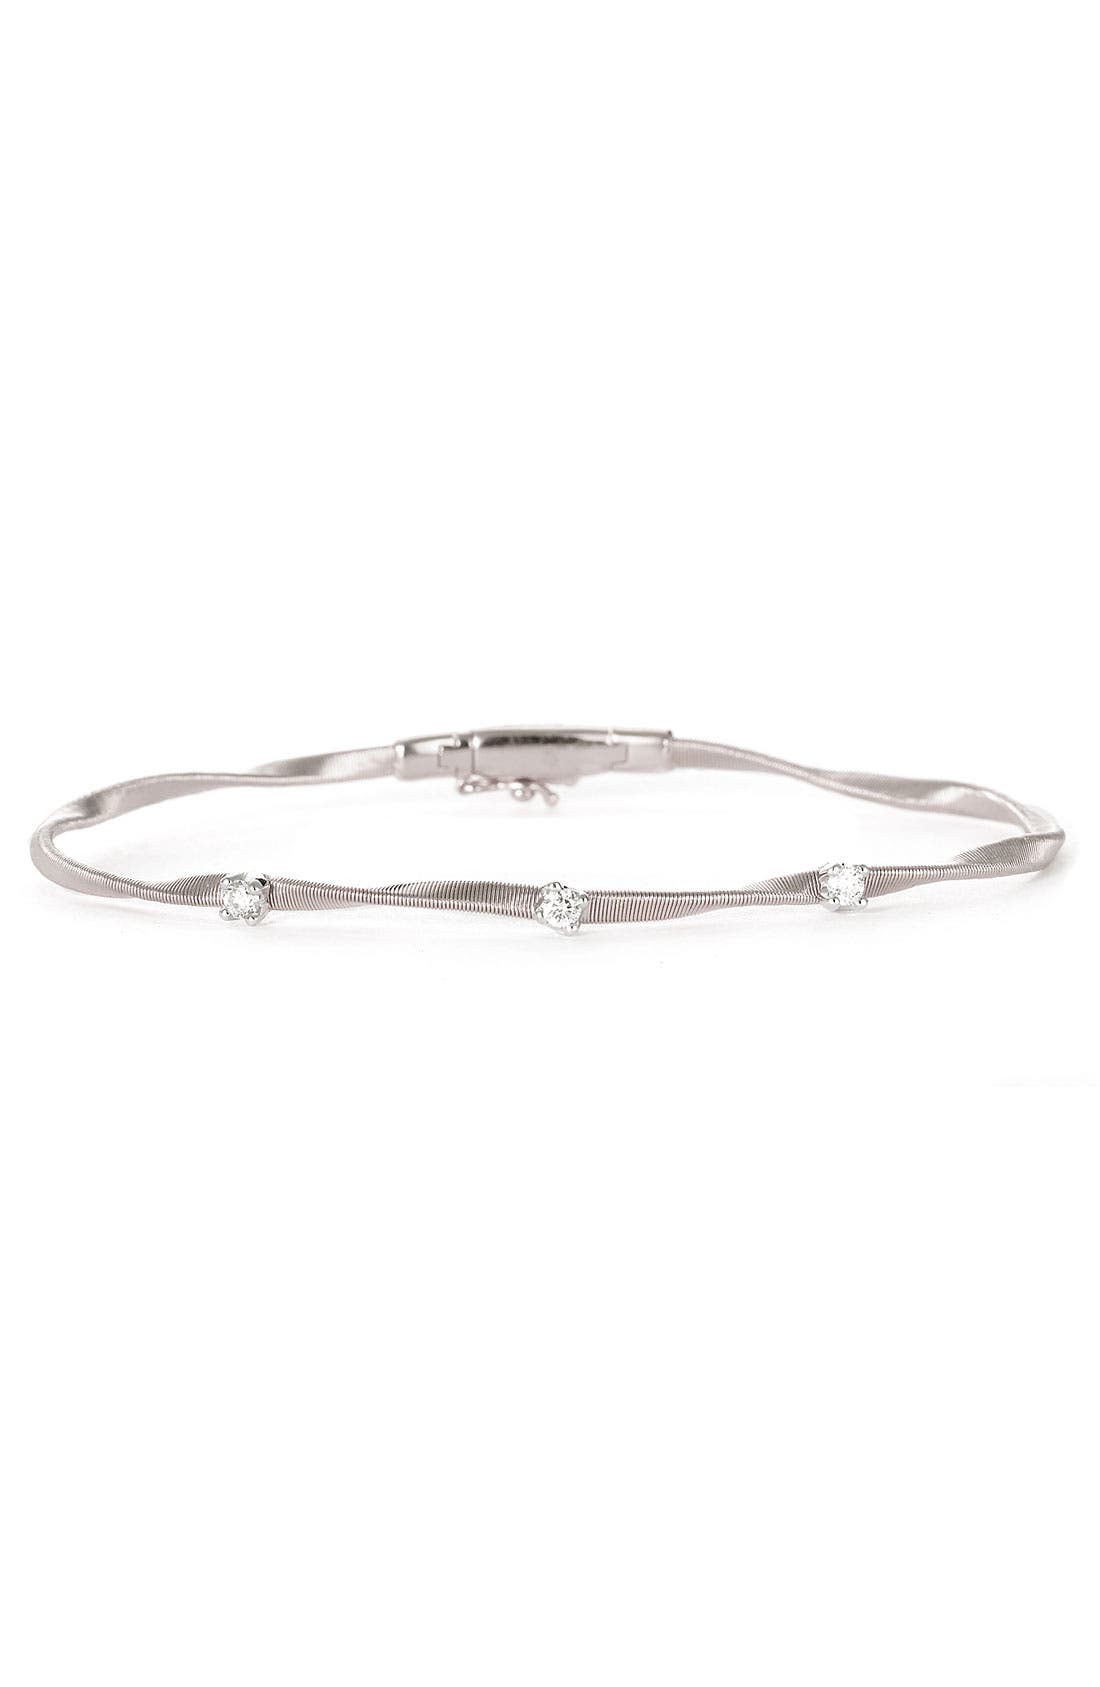 Main Image - Marco Bicego 'Marrakech' Single Strand Diamond Bracelet